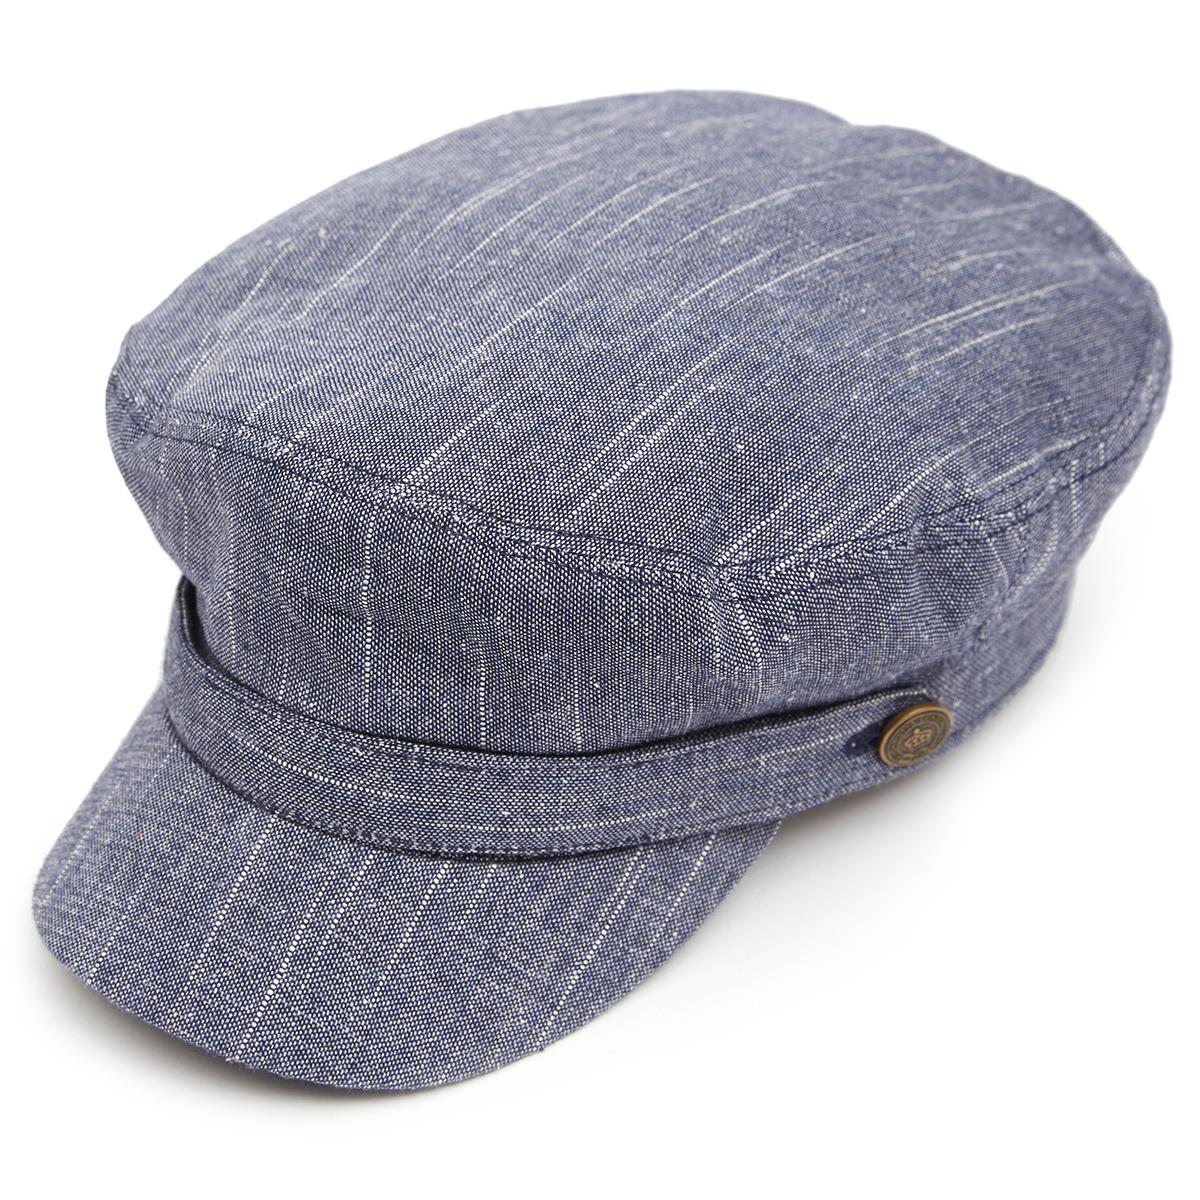 Breton Linen Mix Cap -Navy in XL